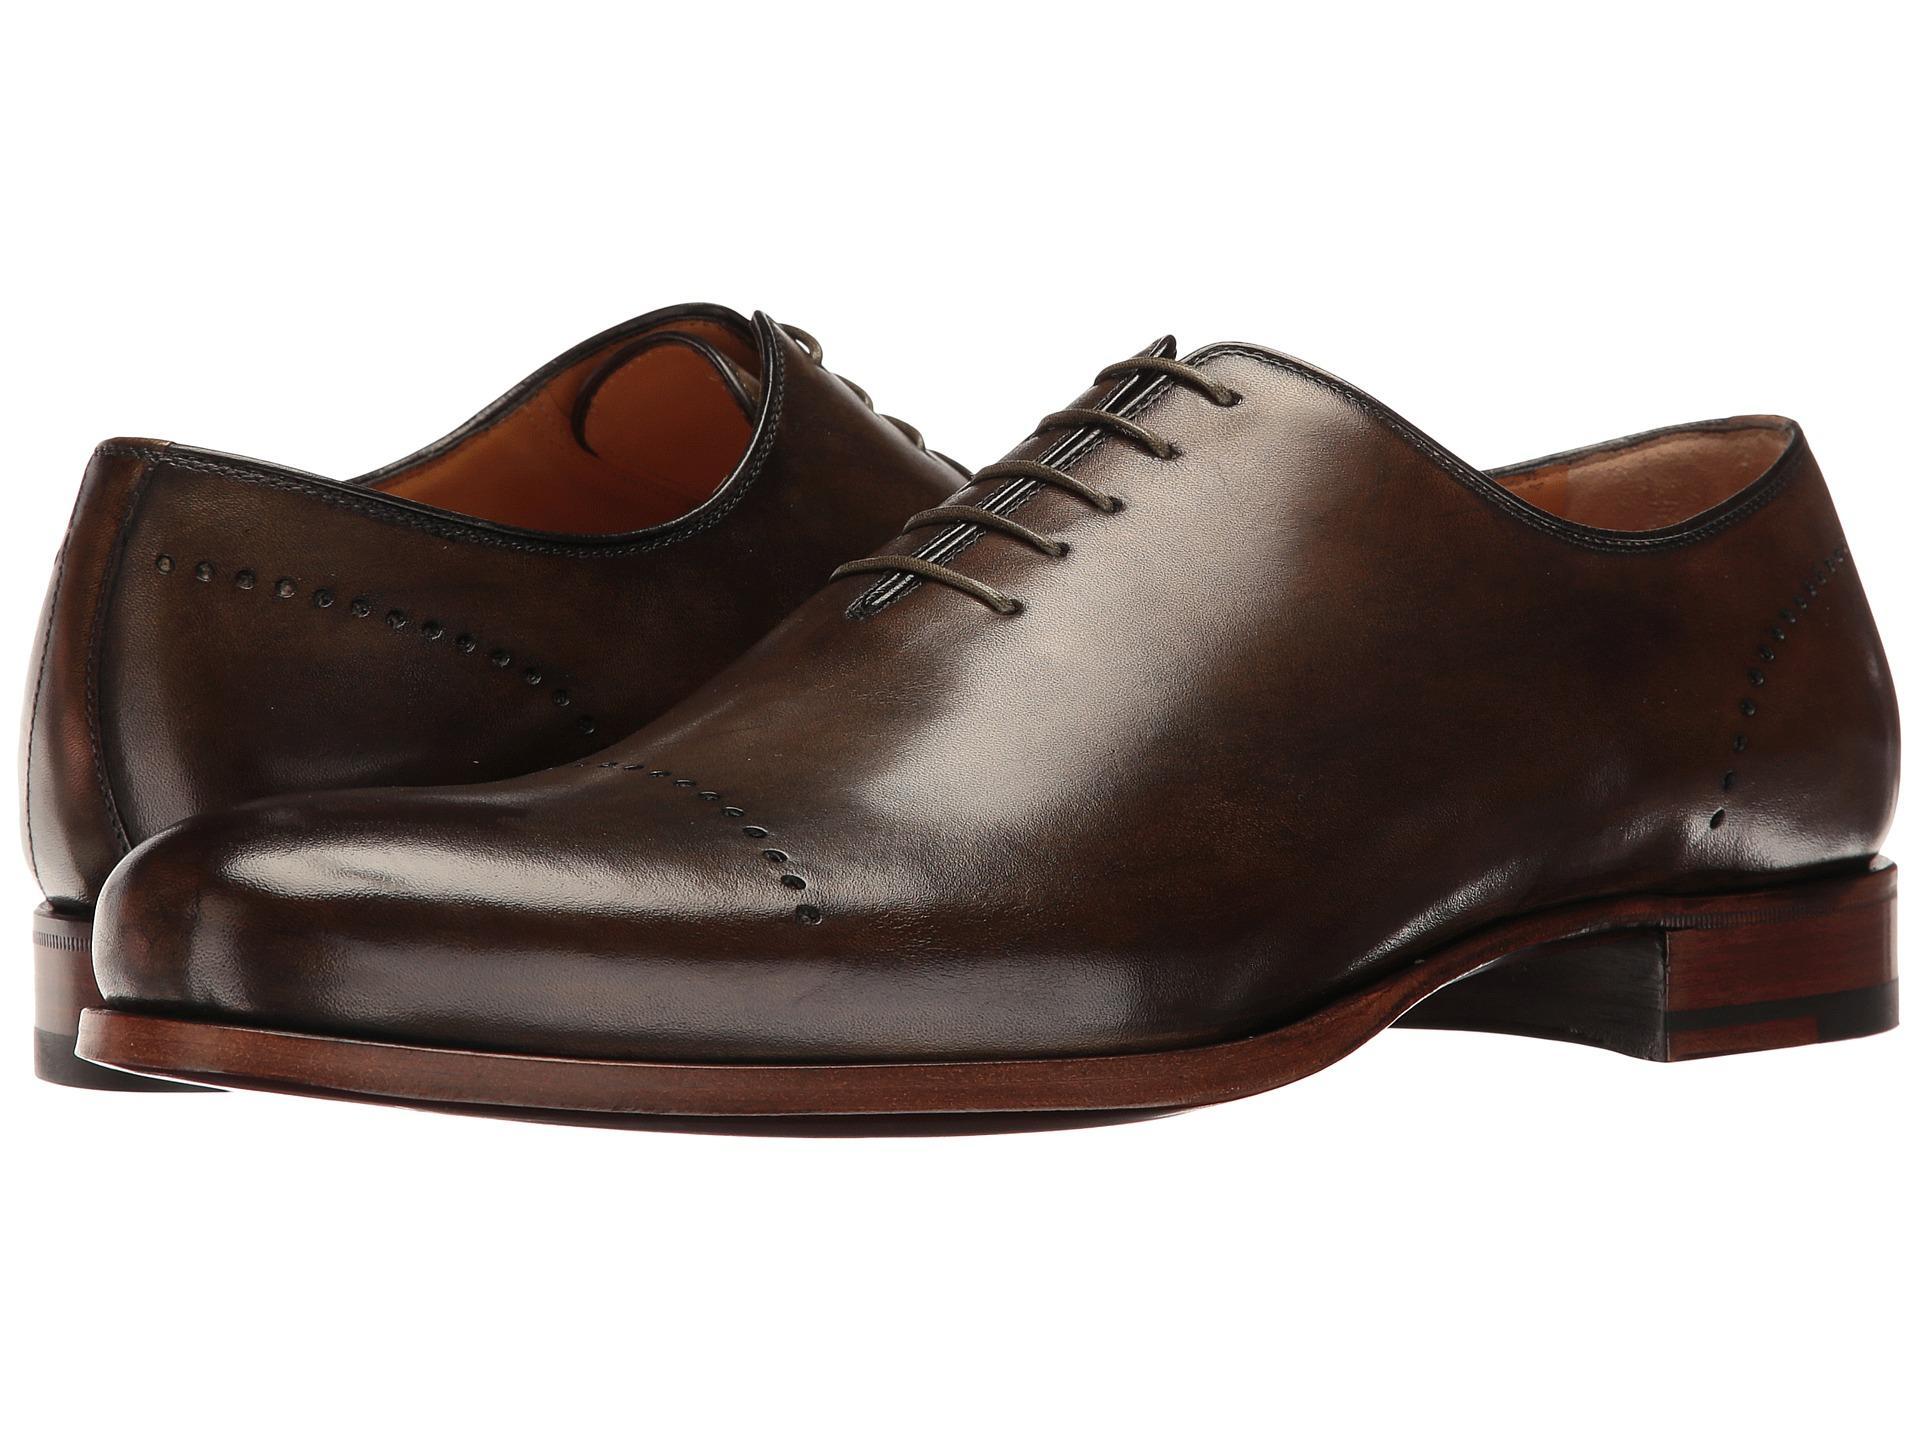 Testoni Shoes Sale